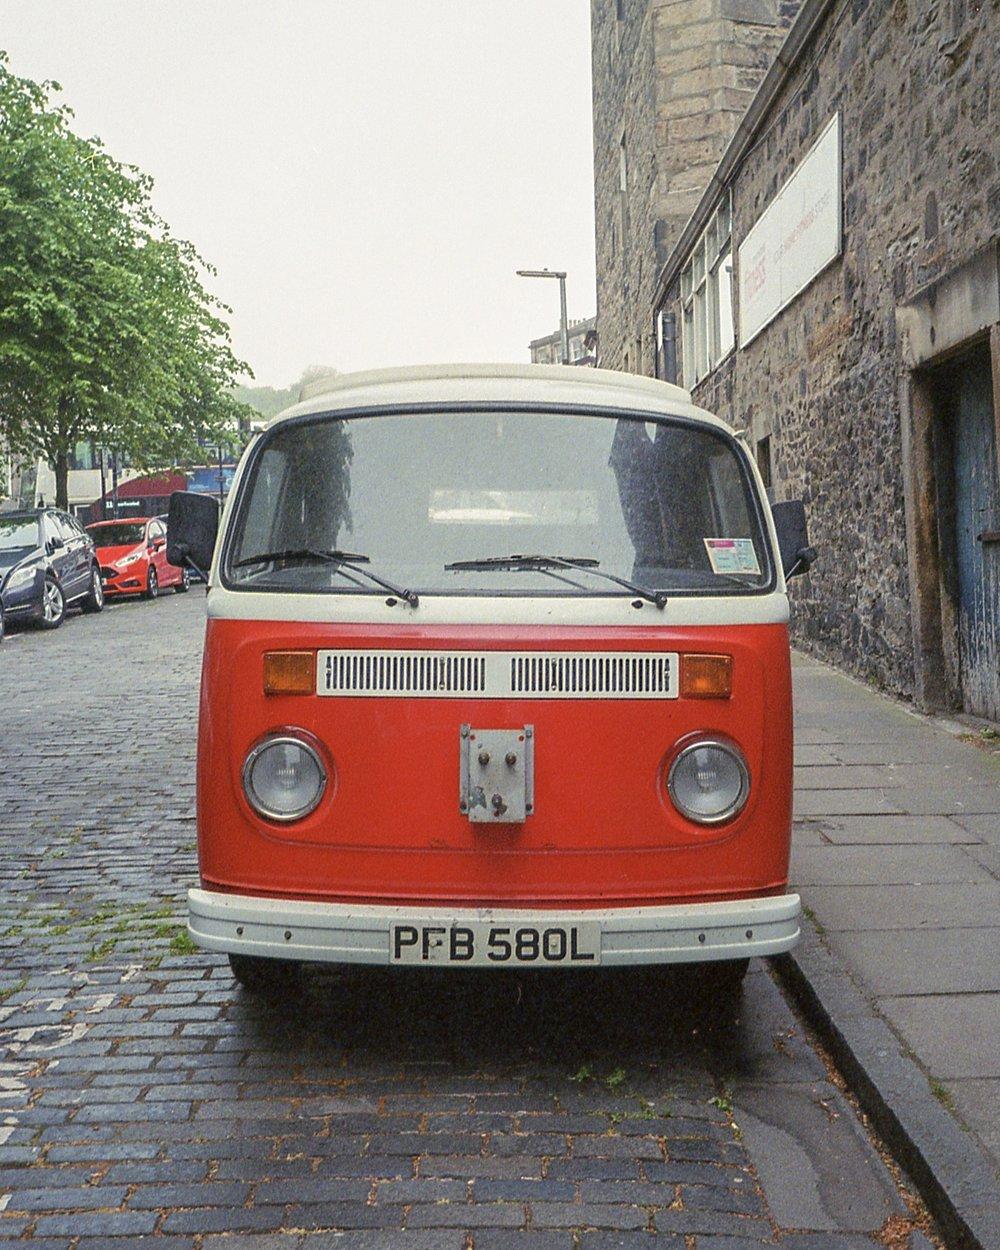 Edinburgh, Olympus Mju2, Kodak Gold 400